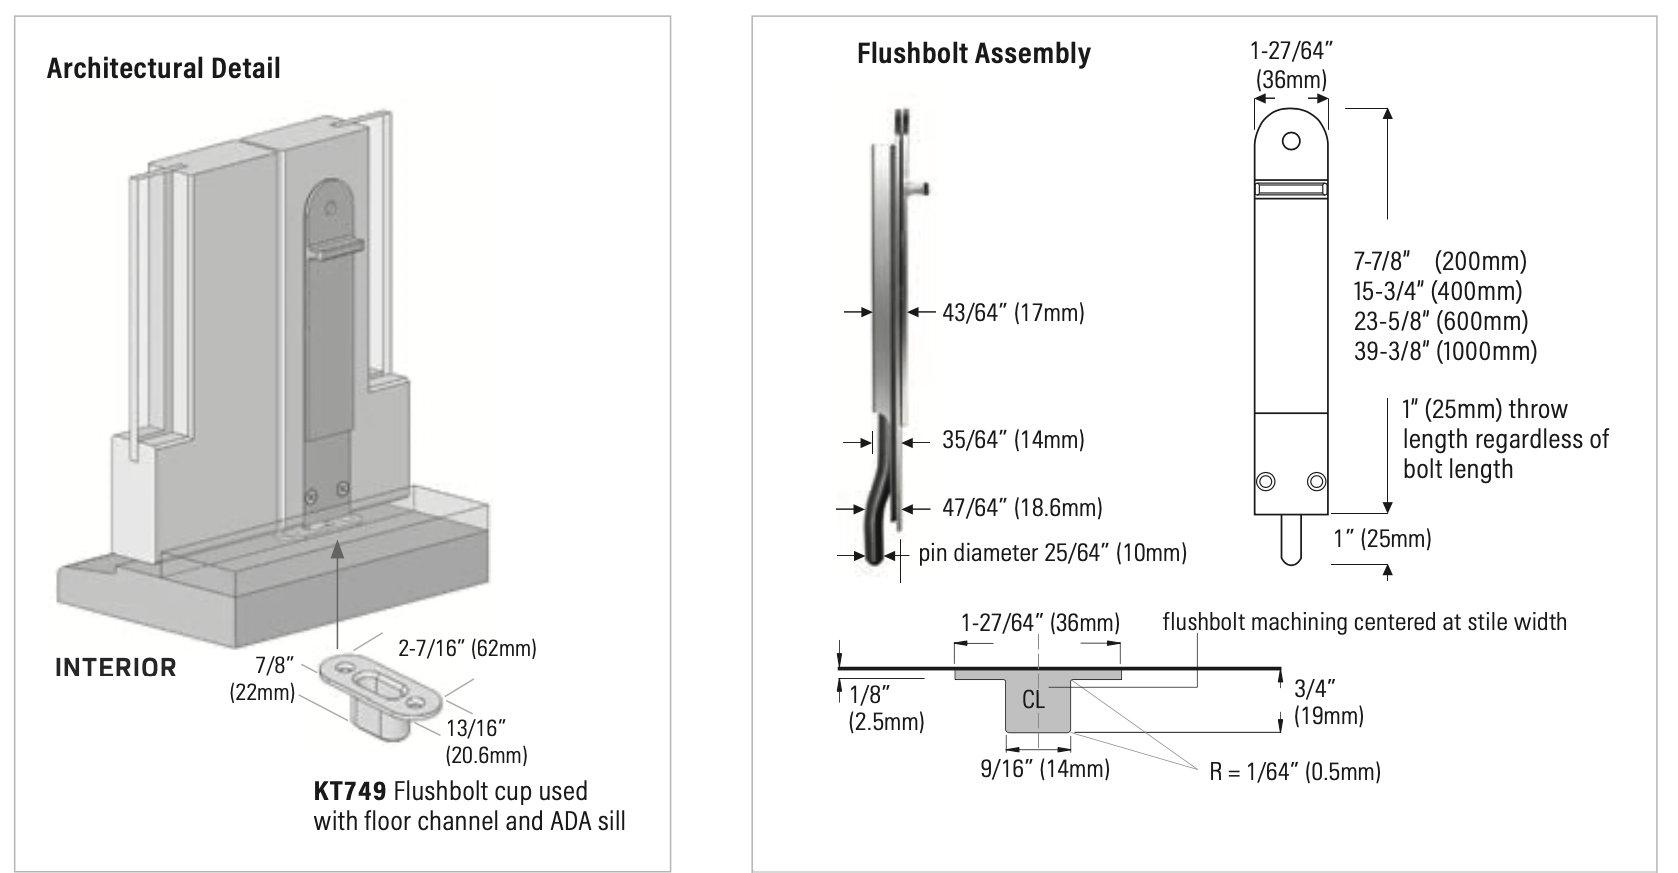 Rail n Stile Bi-Fold Doors architectural detail and flushbolt assembly